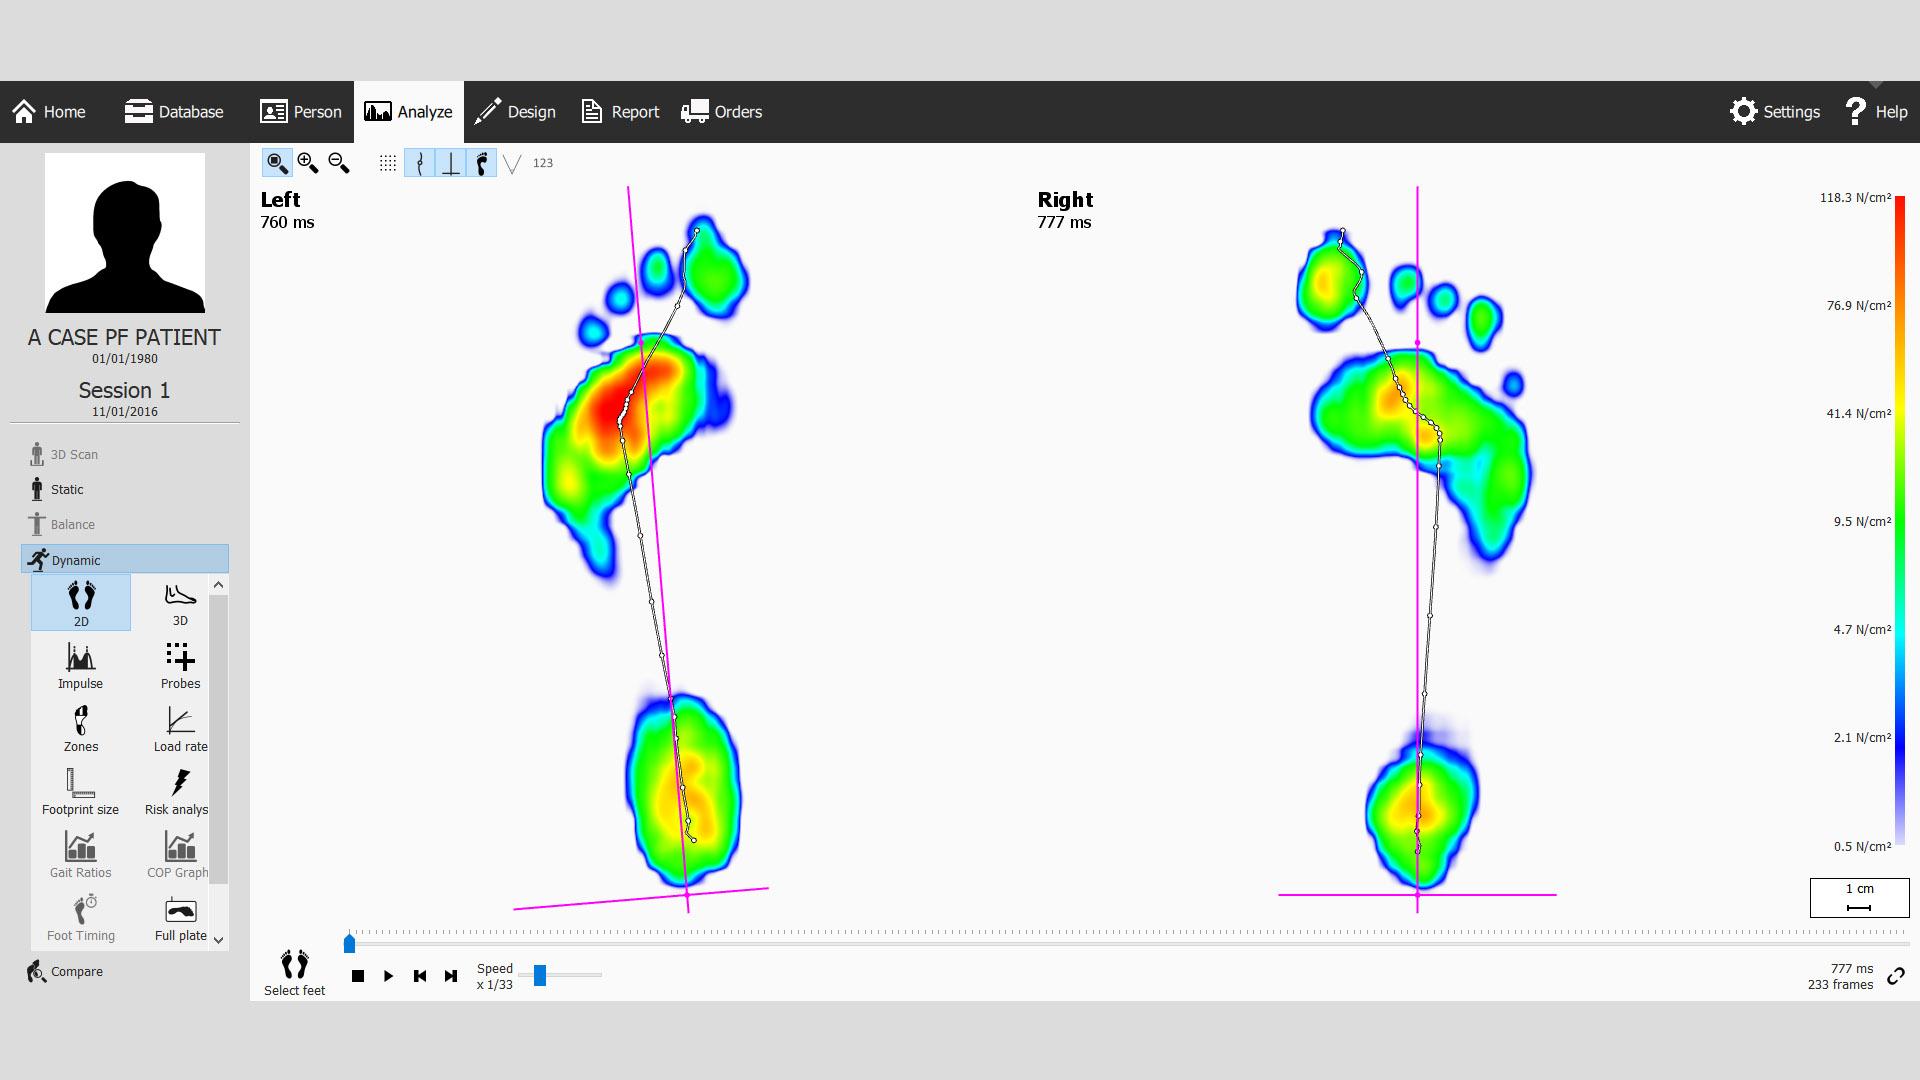 Dynamic Gait Analysis Plantar Fasciitis